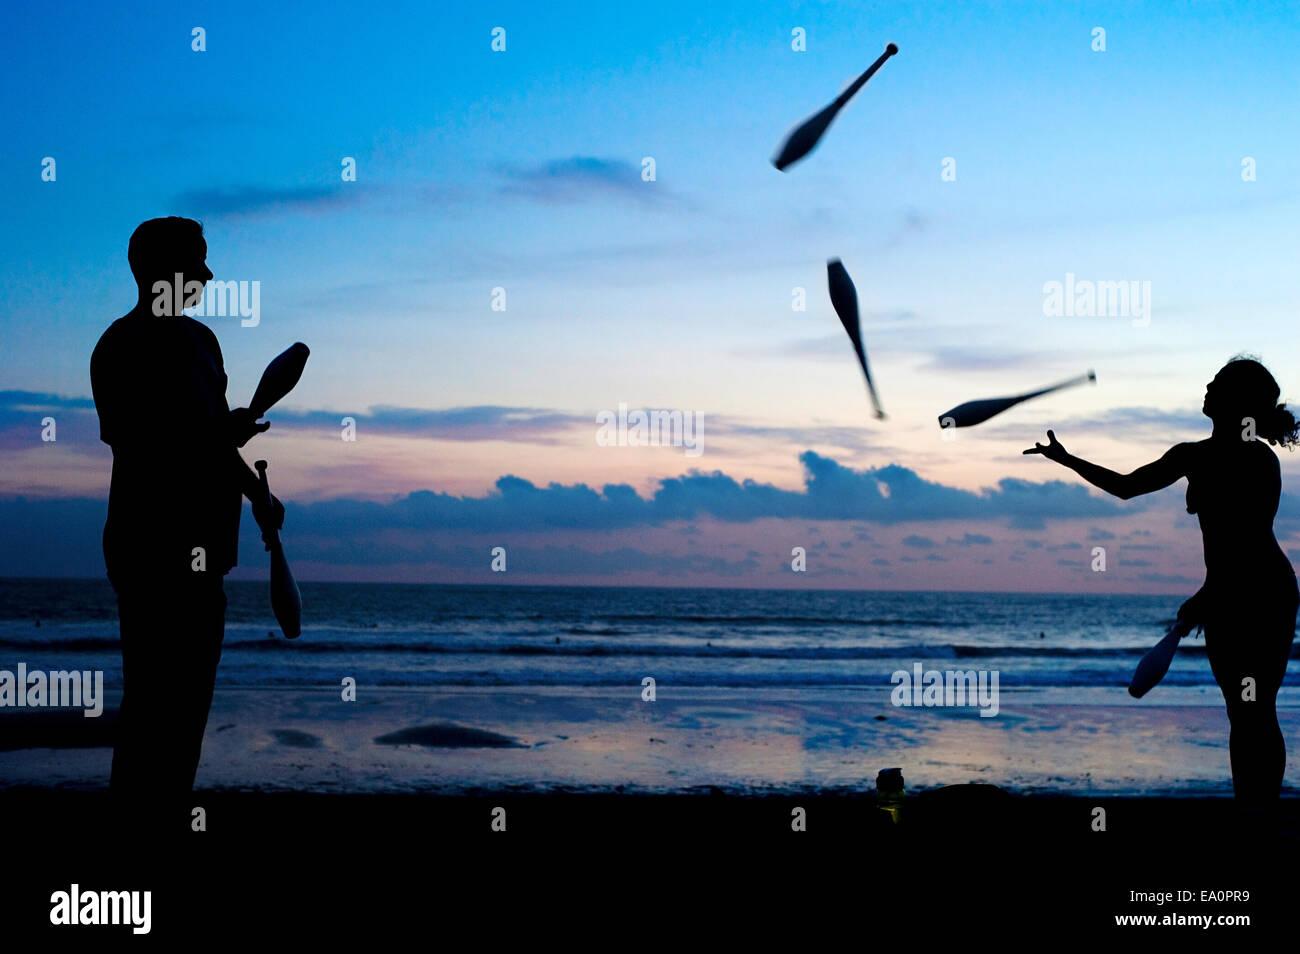 Juggling at sunset - Stock Image